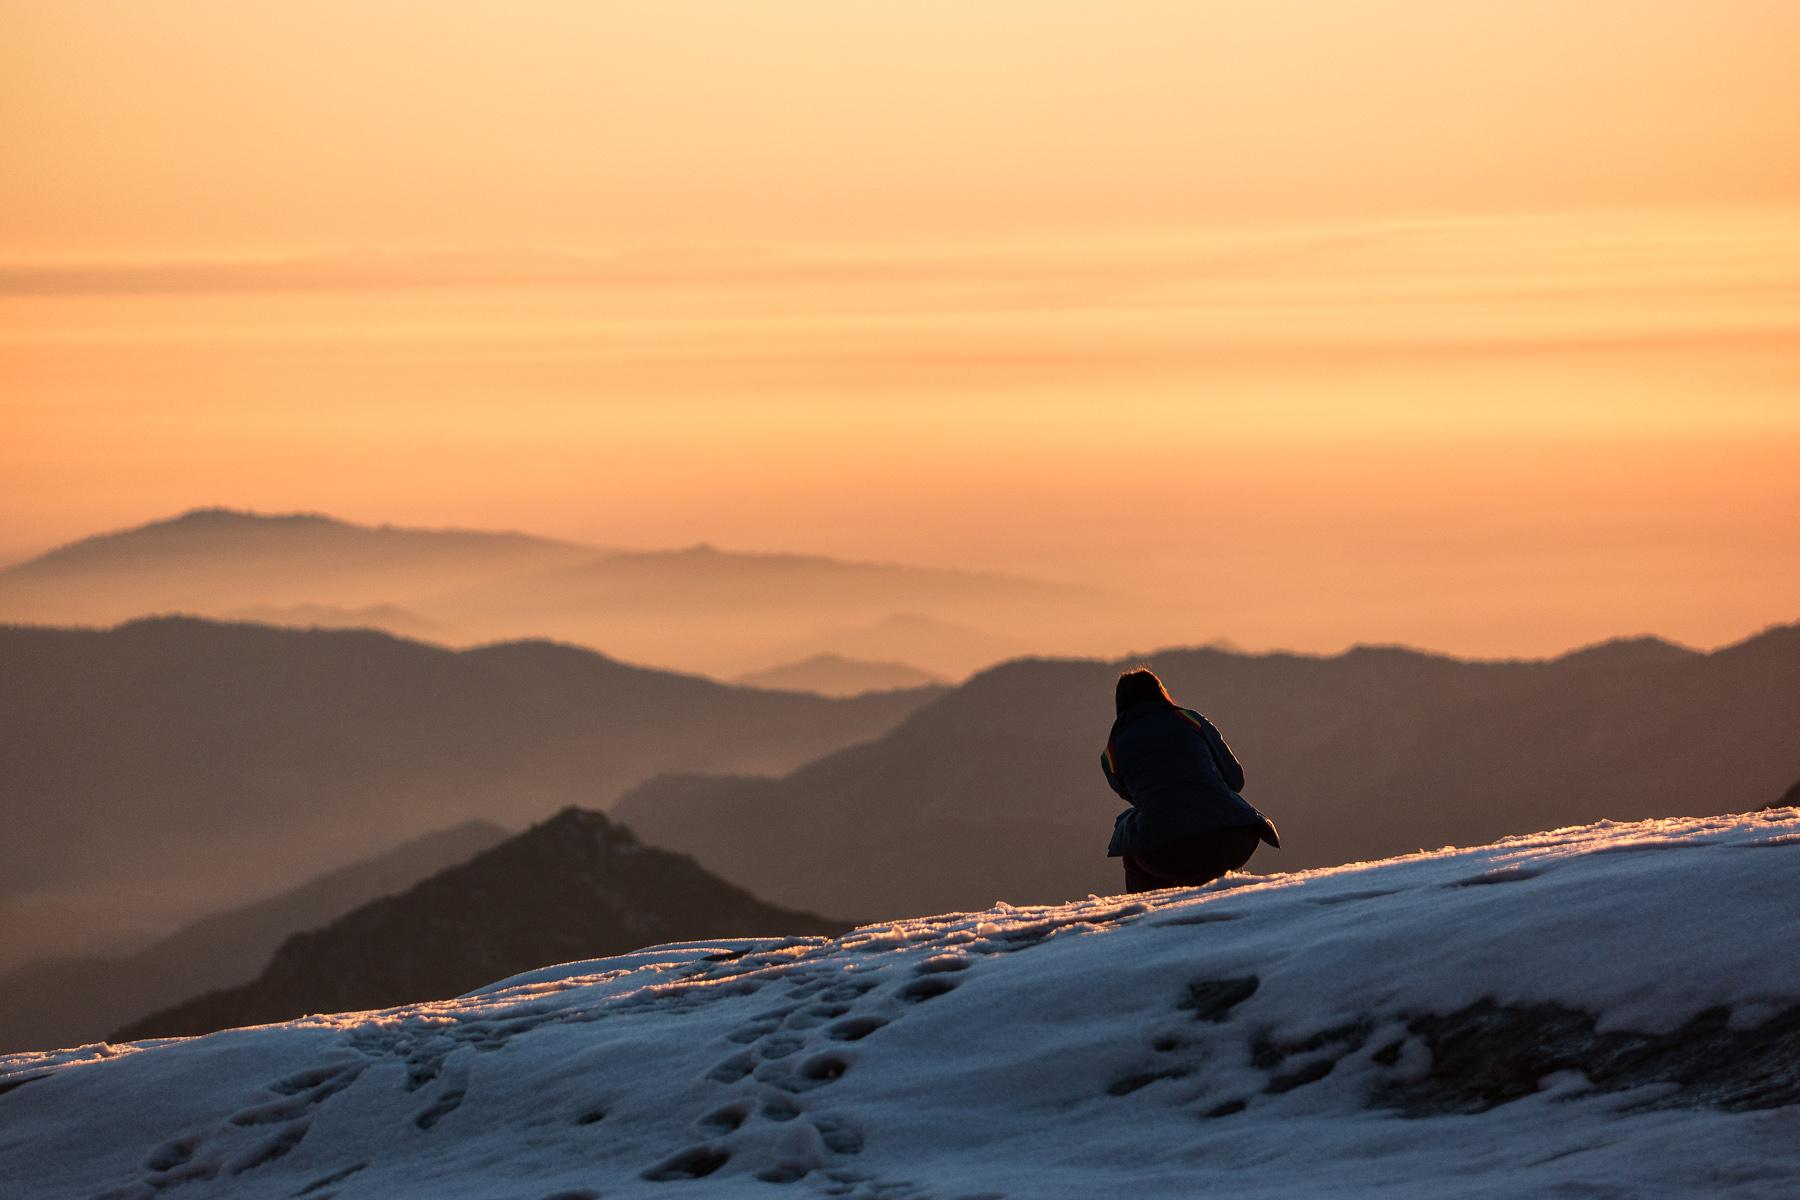 Wasim Muklashy Photography_Sequoia National Park_California_December 2015_-SAM_4160-Edit.jpg